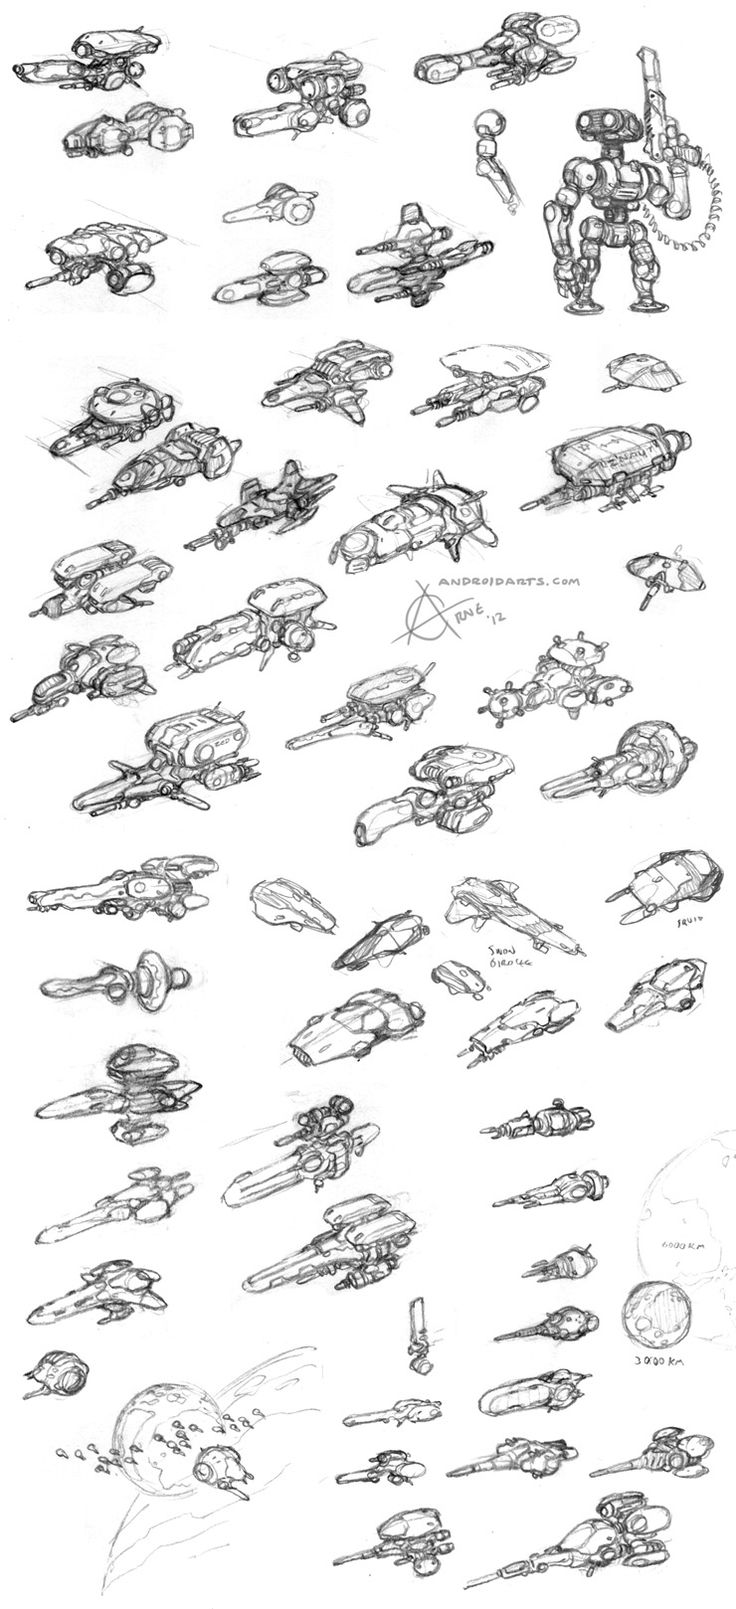 Spaceships via cgpin.com